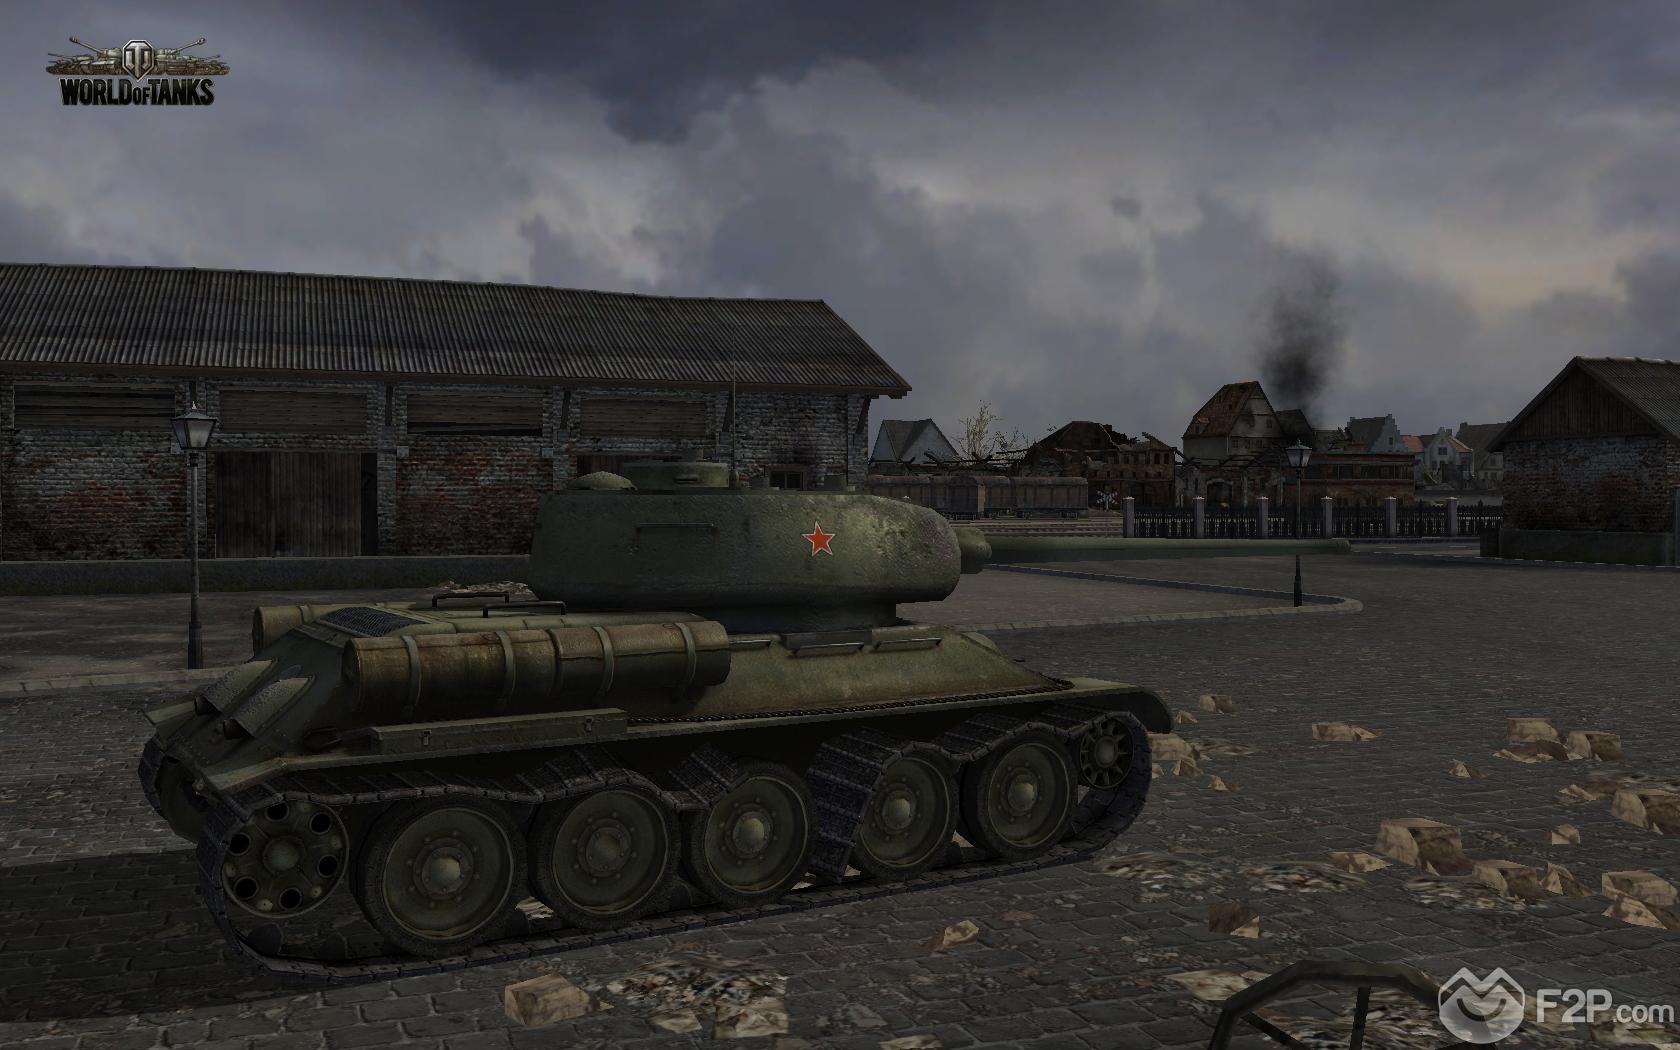 Click image for larger version.Name:World of Tanks 59.jpgViews:129Size:1.02 MBID:3846